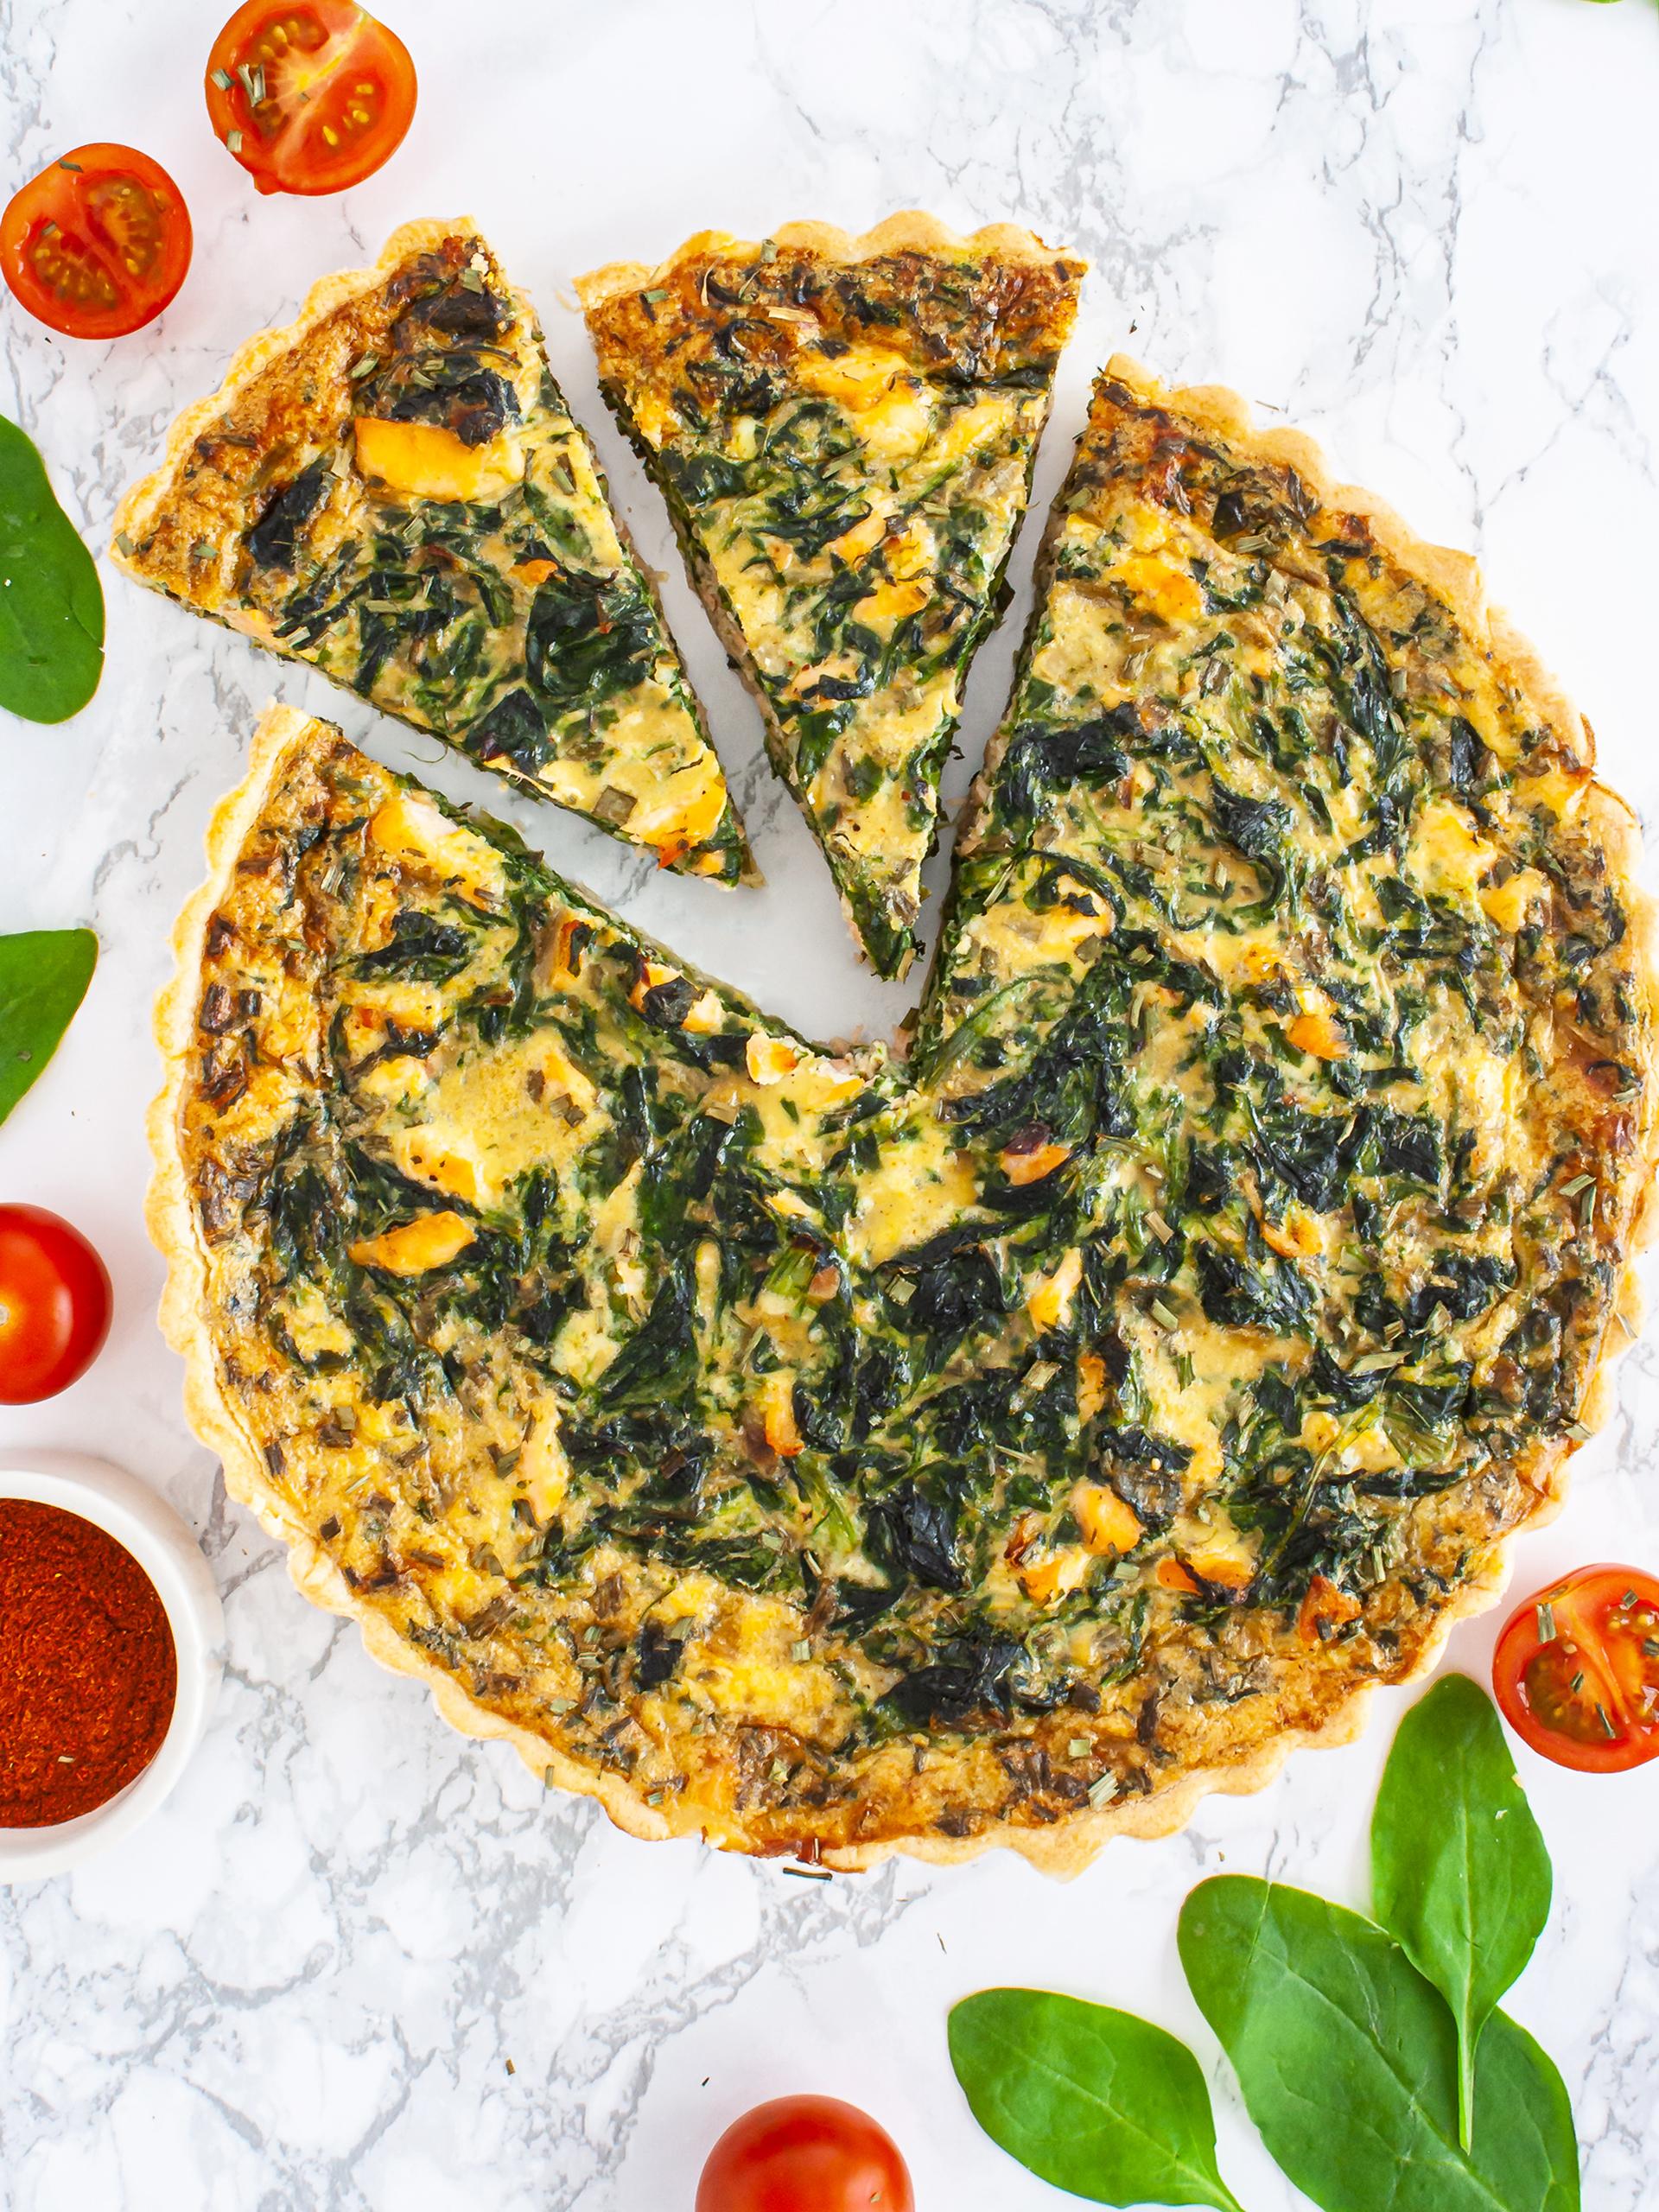 Dairy Free Salmon and Spinach Quiche Recipe Preview